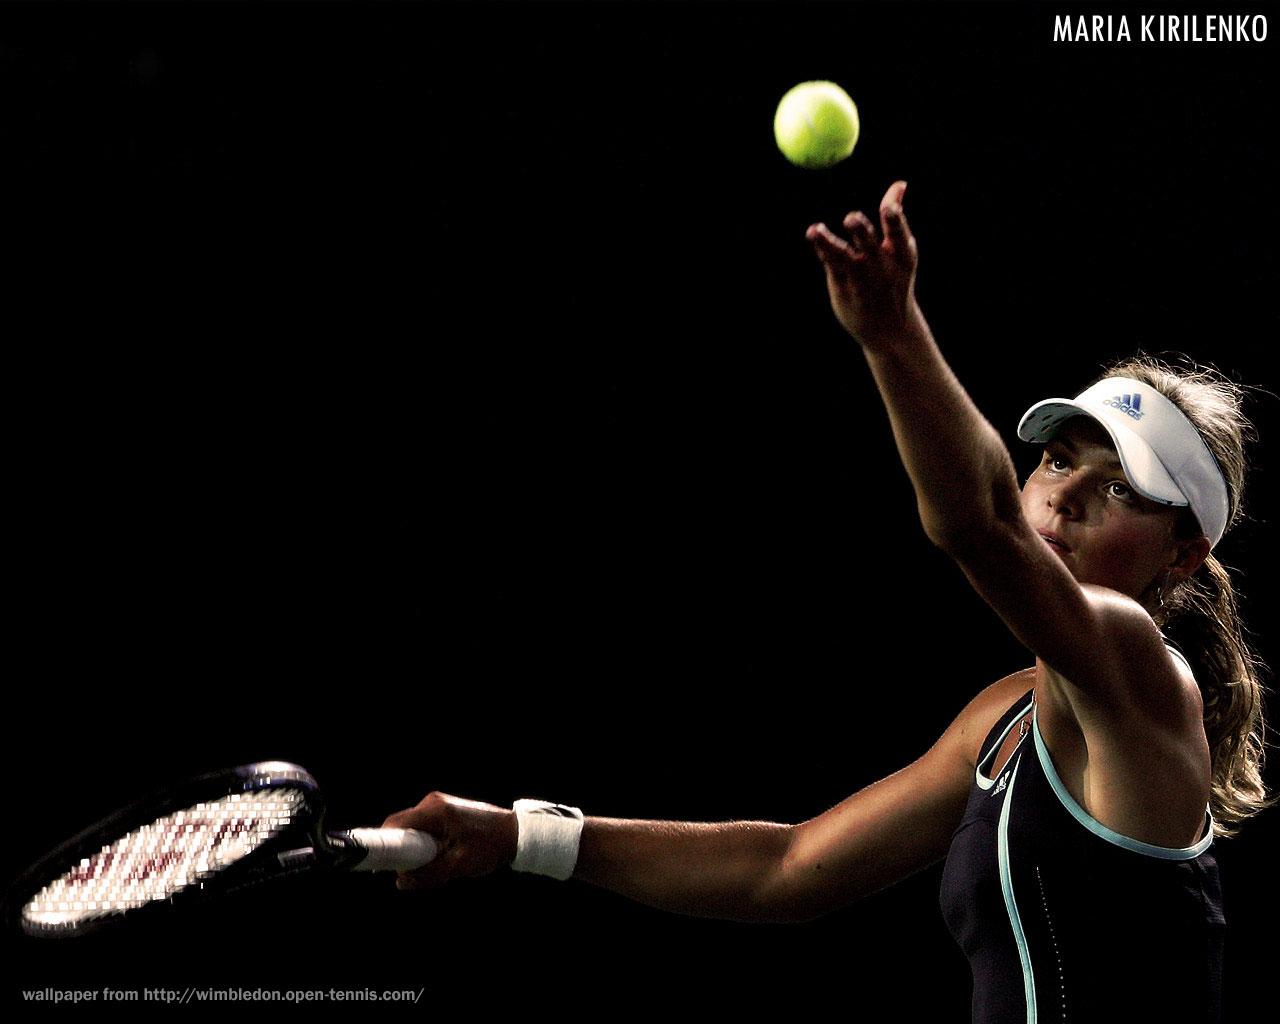 All Sport Wallpaper Hd: All Sports Superstars: Maria Kirilenko HD Wallpapers 2012